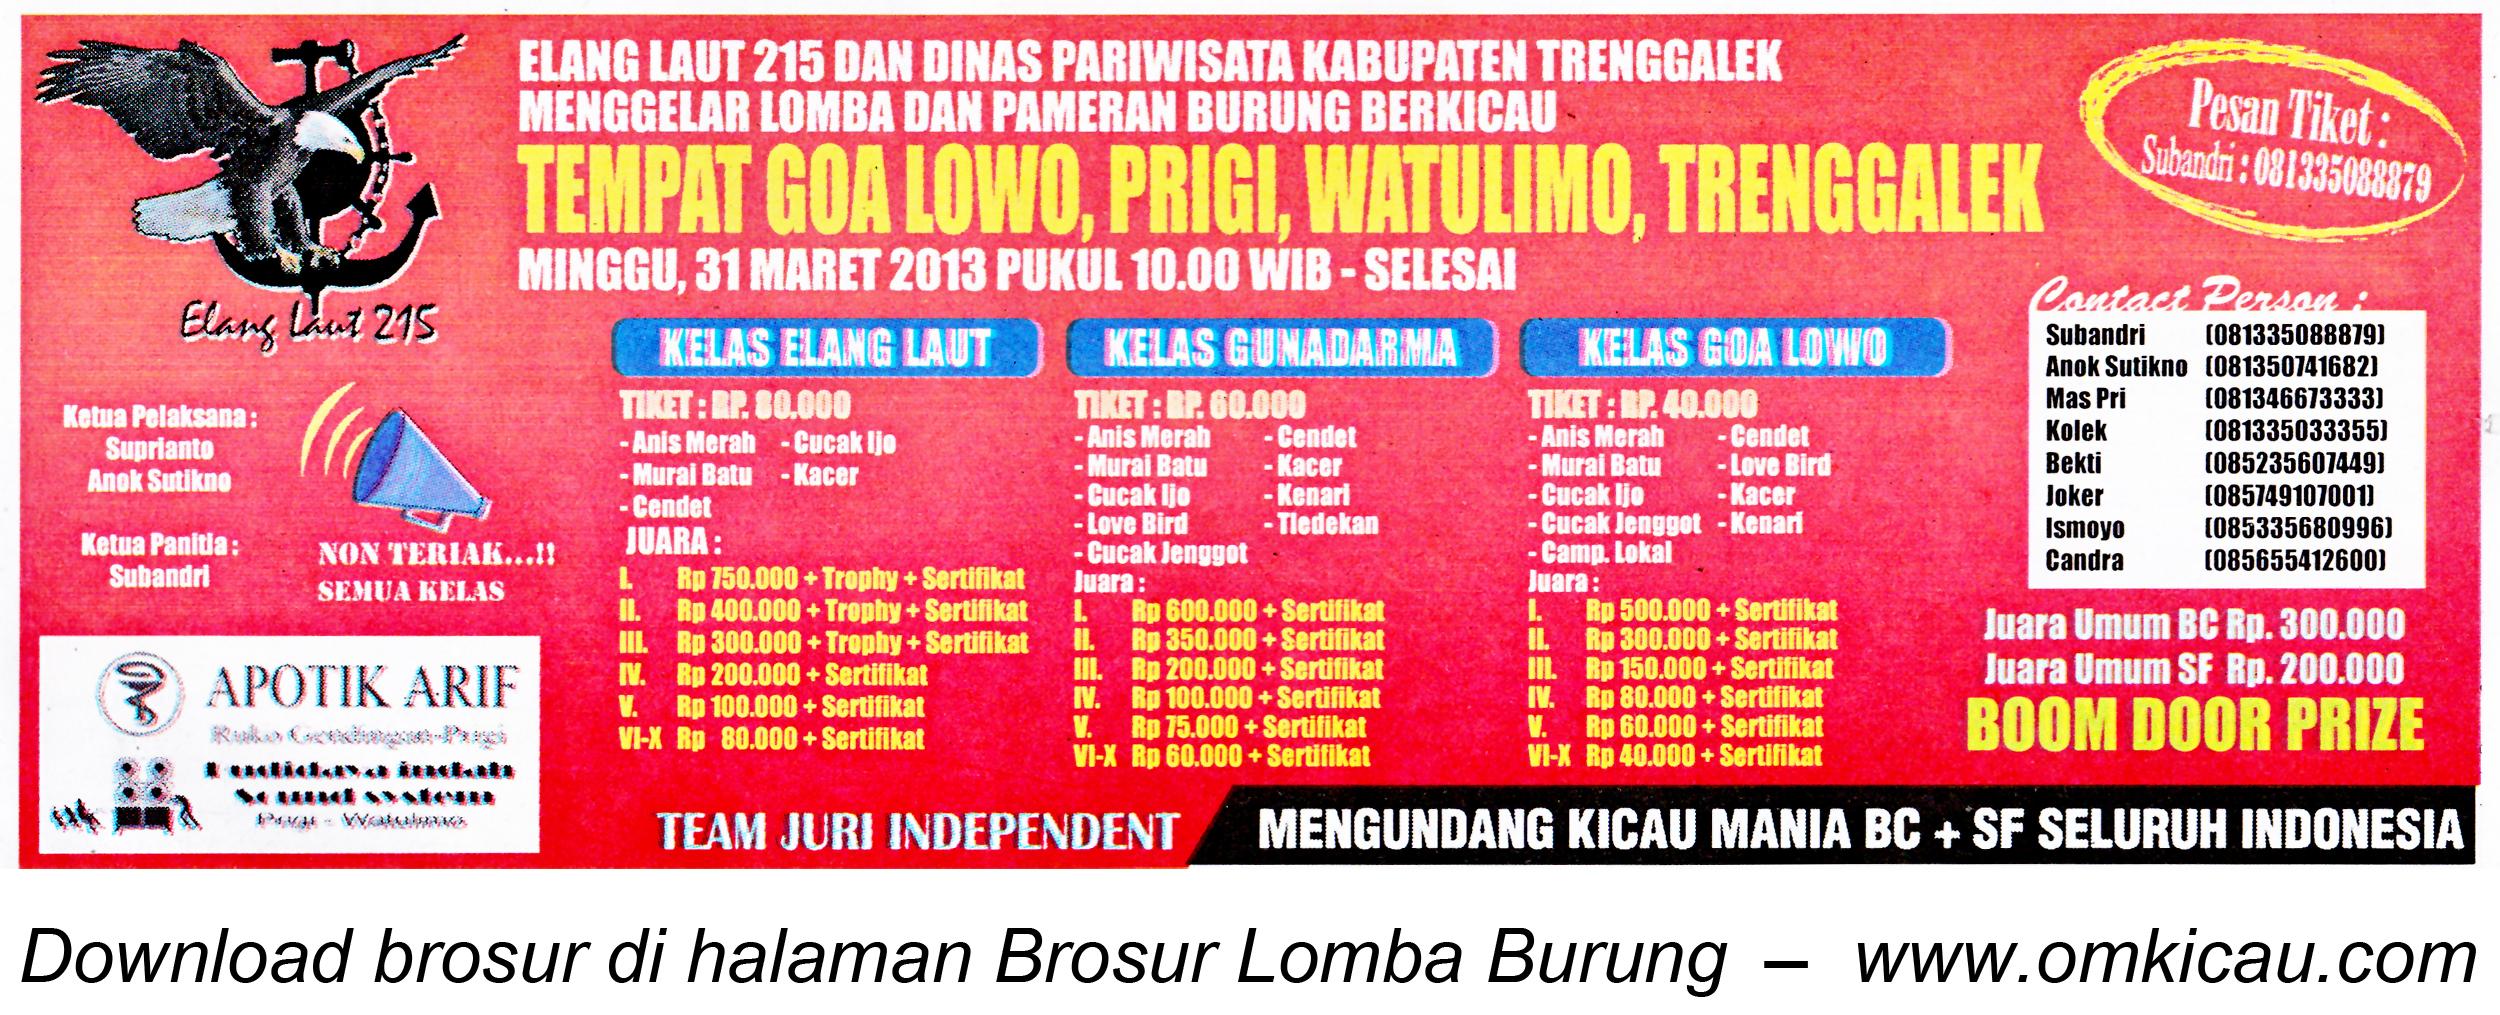 Brosur Lomba Goa Lowo Trenggalek